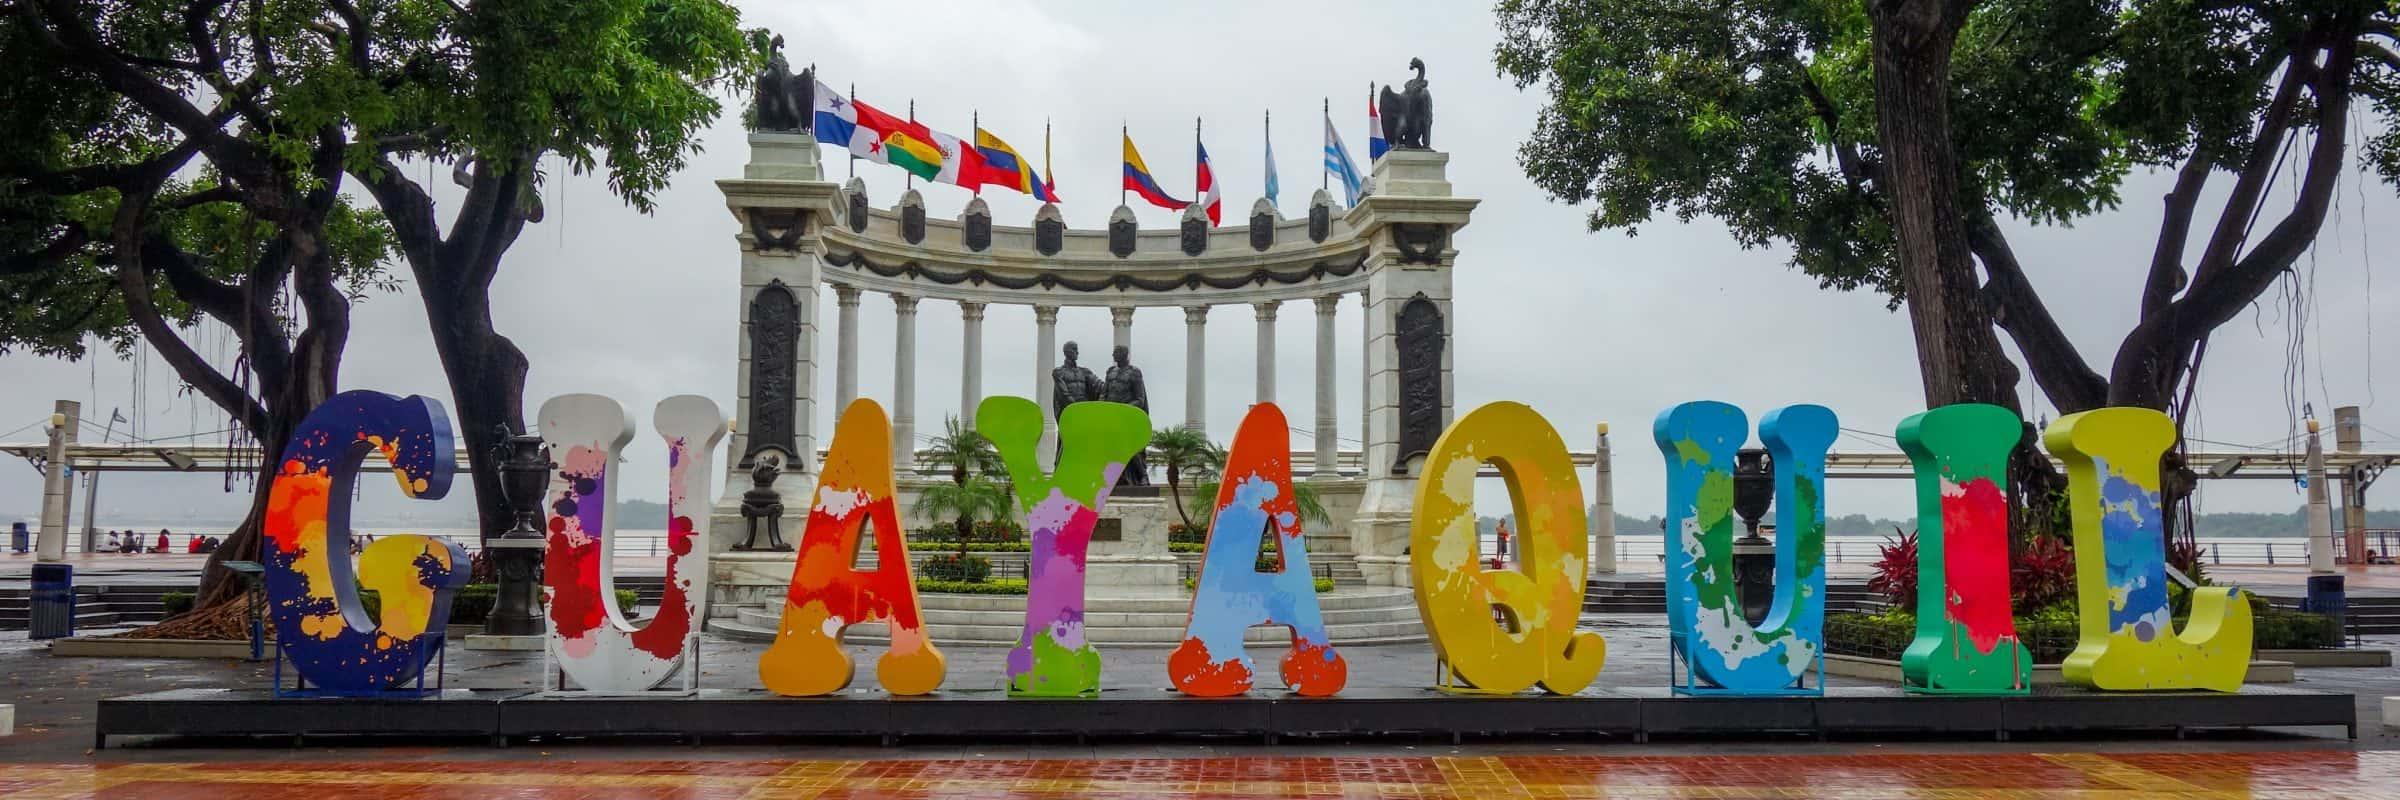 Guayaquil sign, Malecon, Ecuador